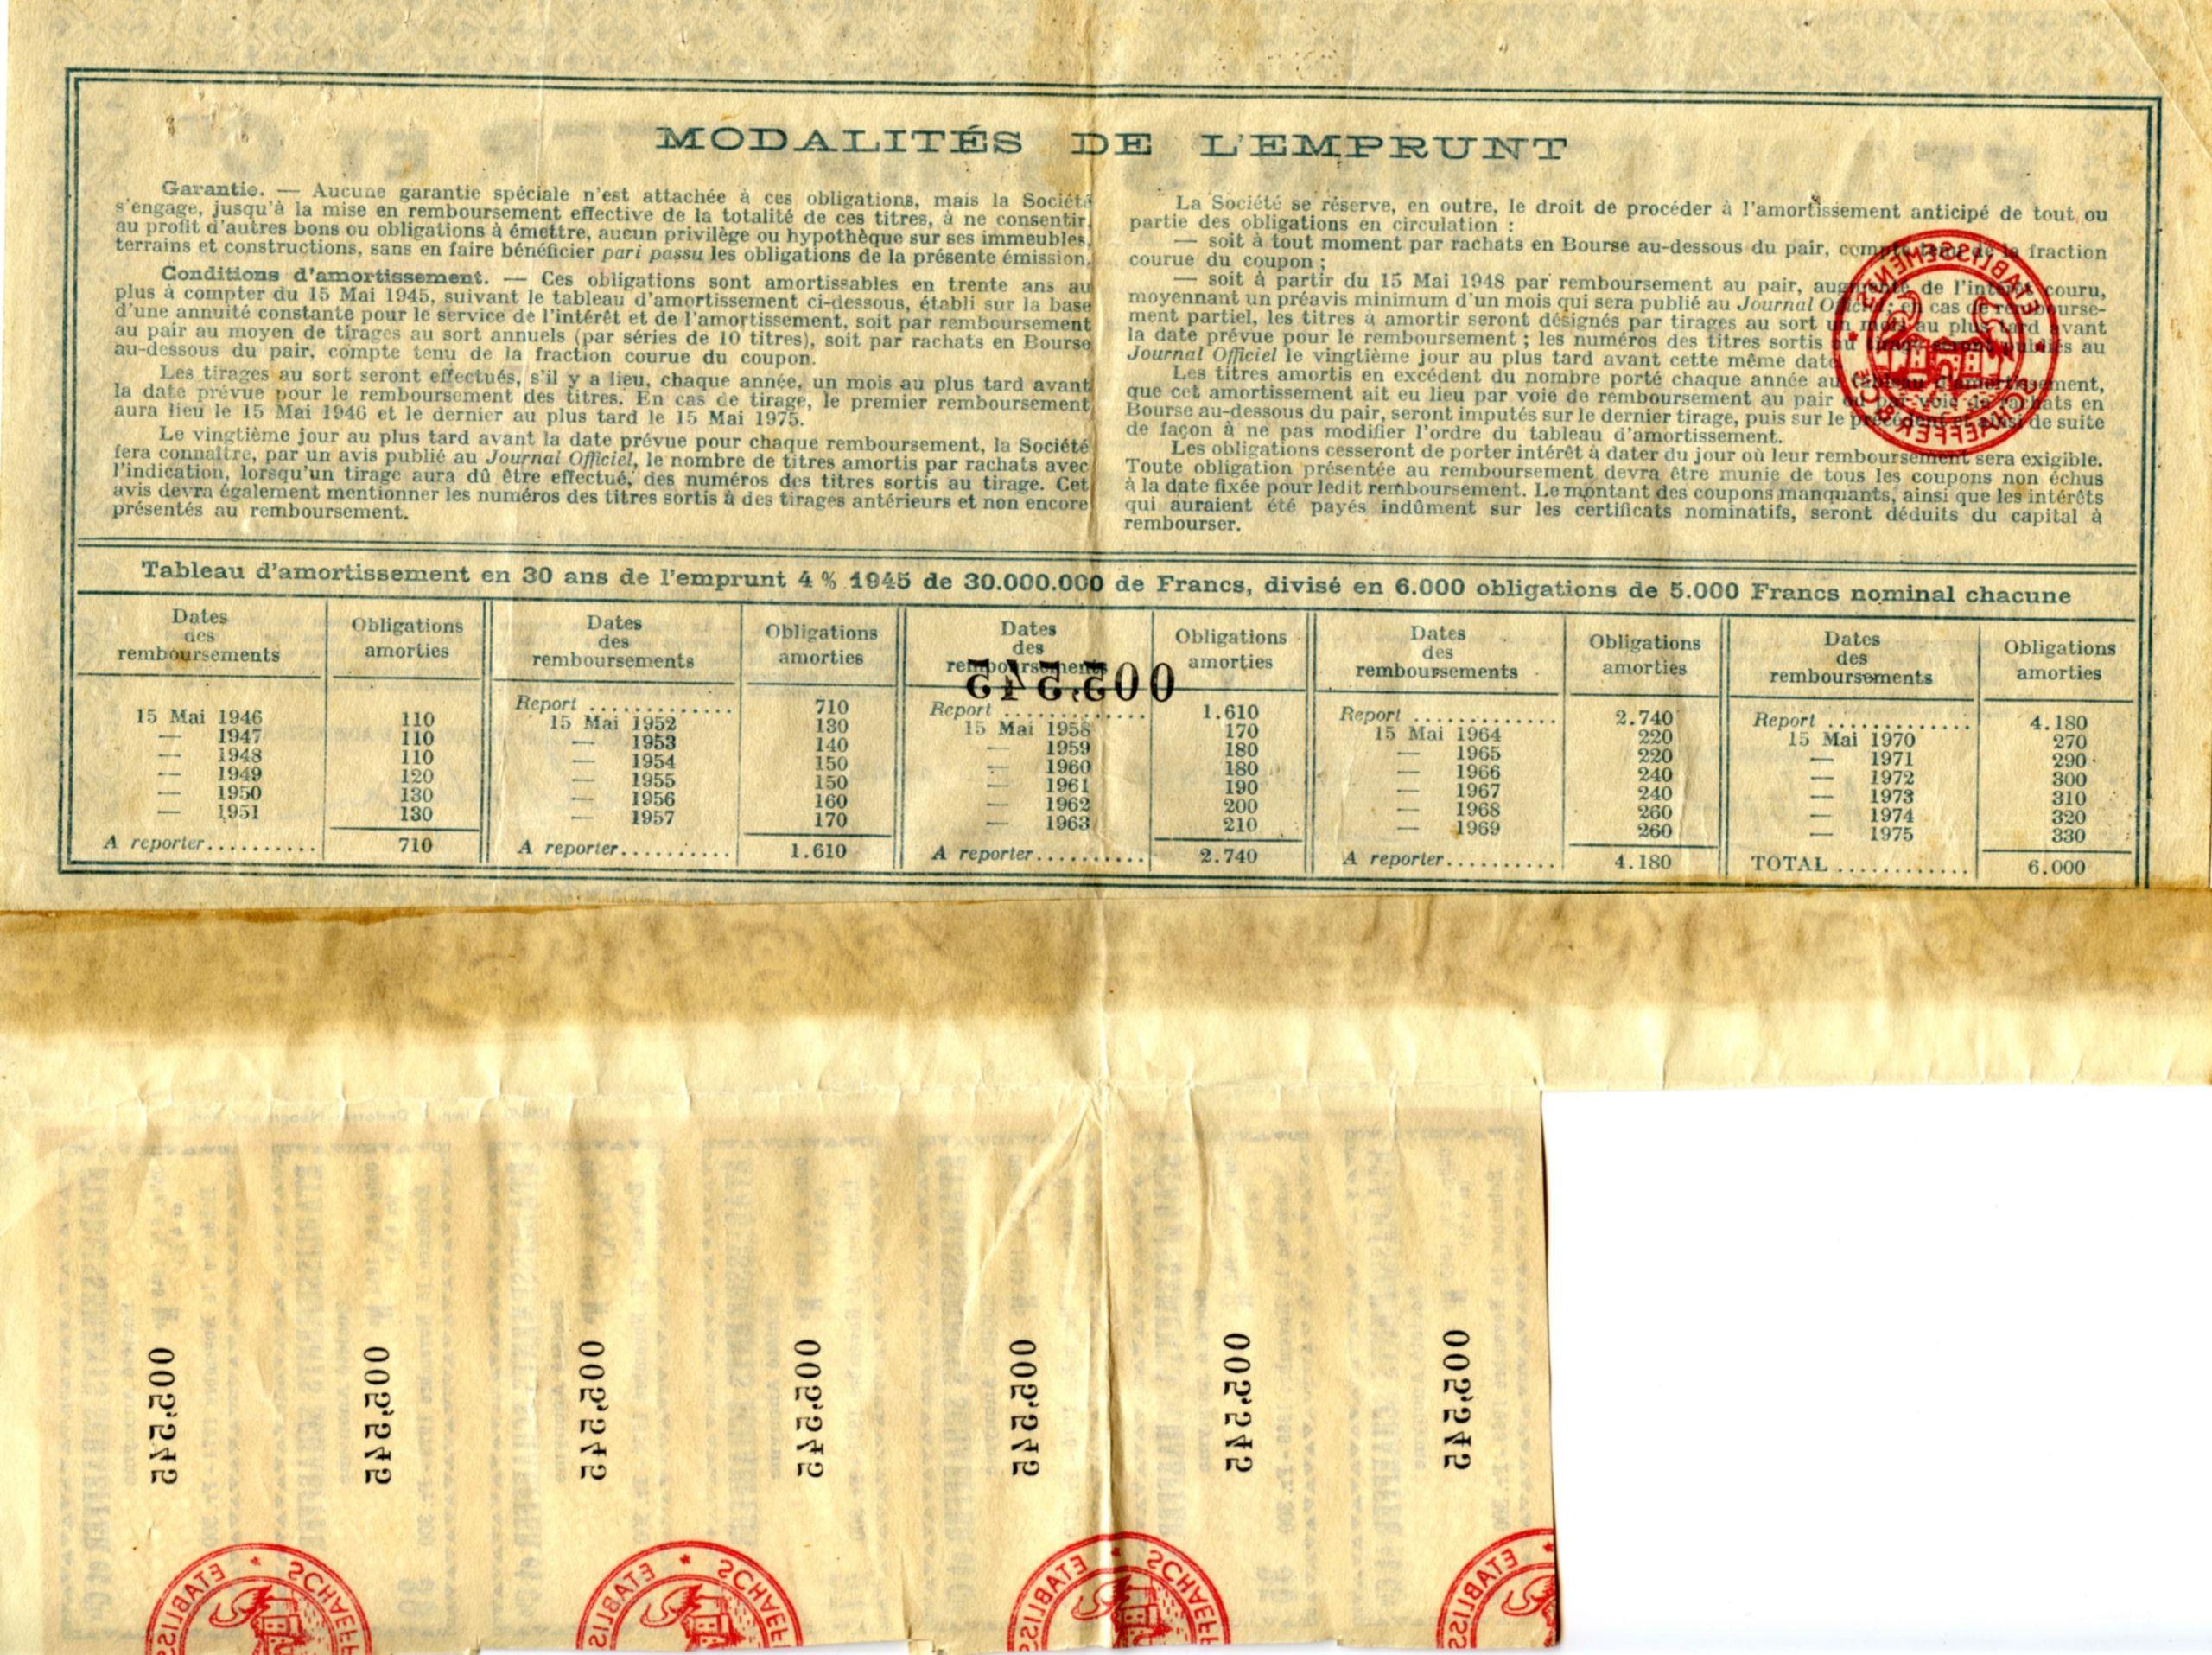 À propos d'obligations datant de 1945 Obliga10